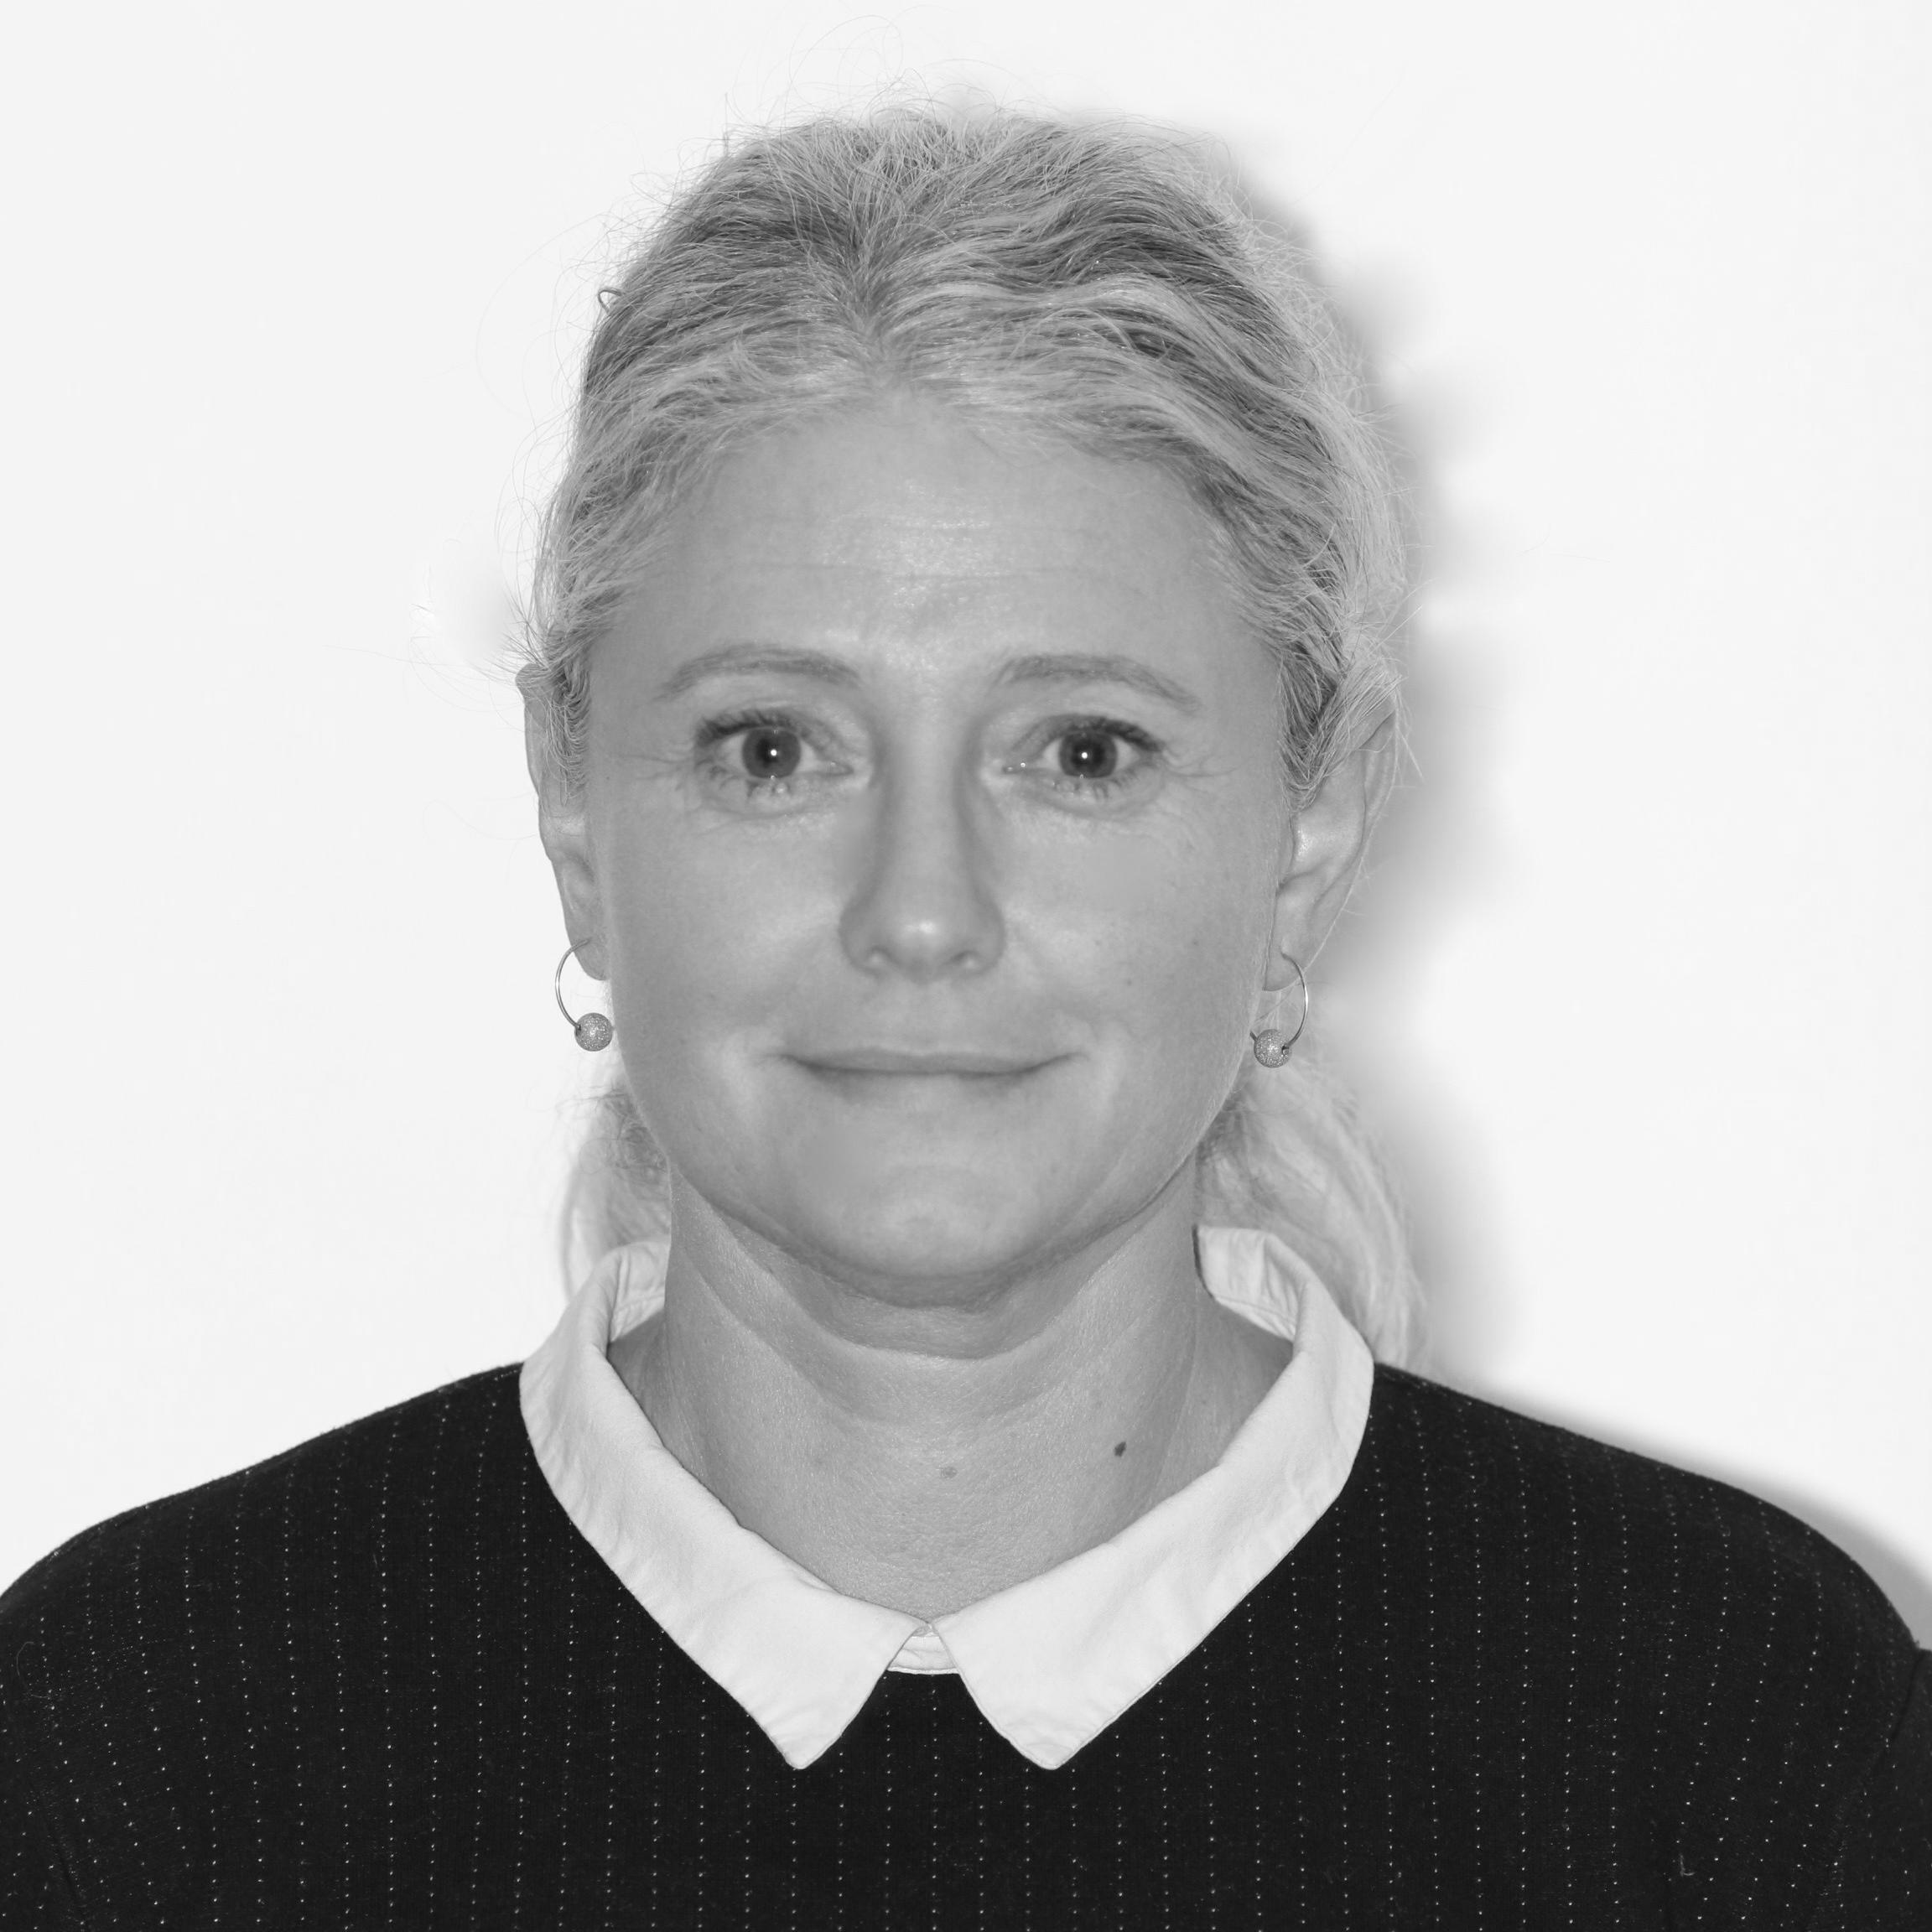 Jane Bæk Thorsen